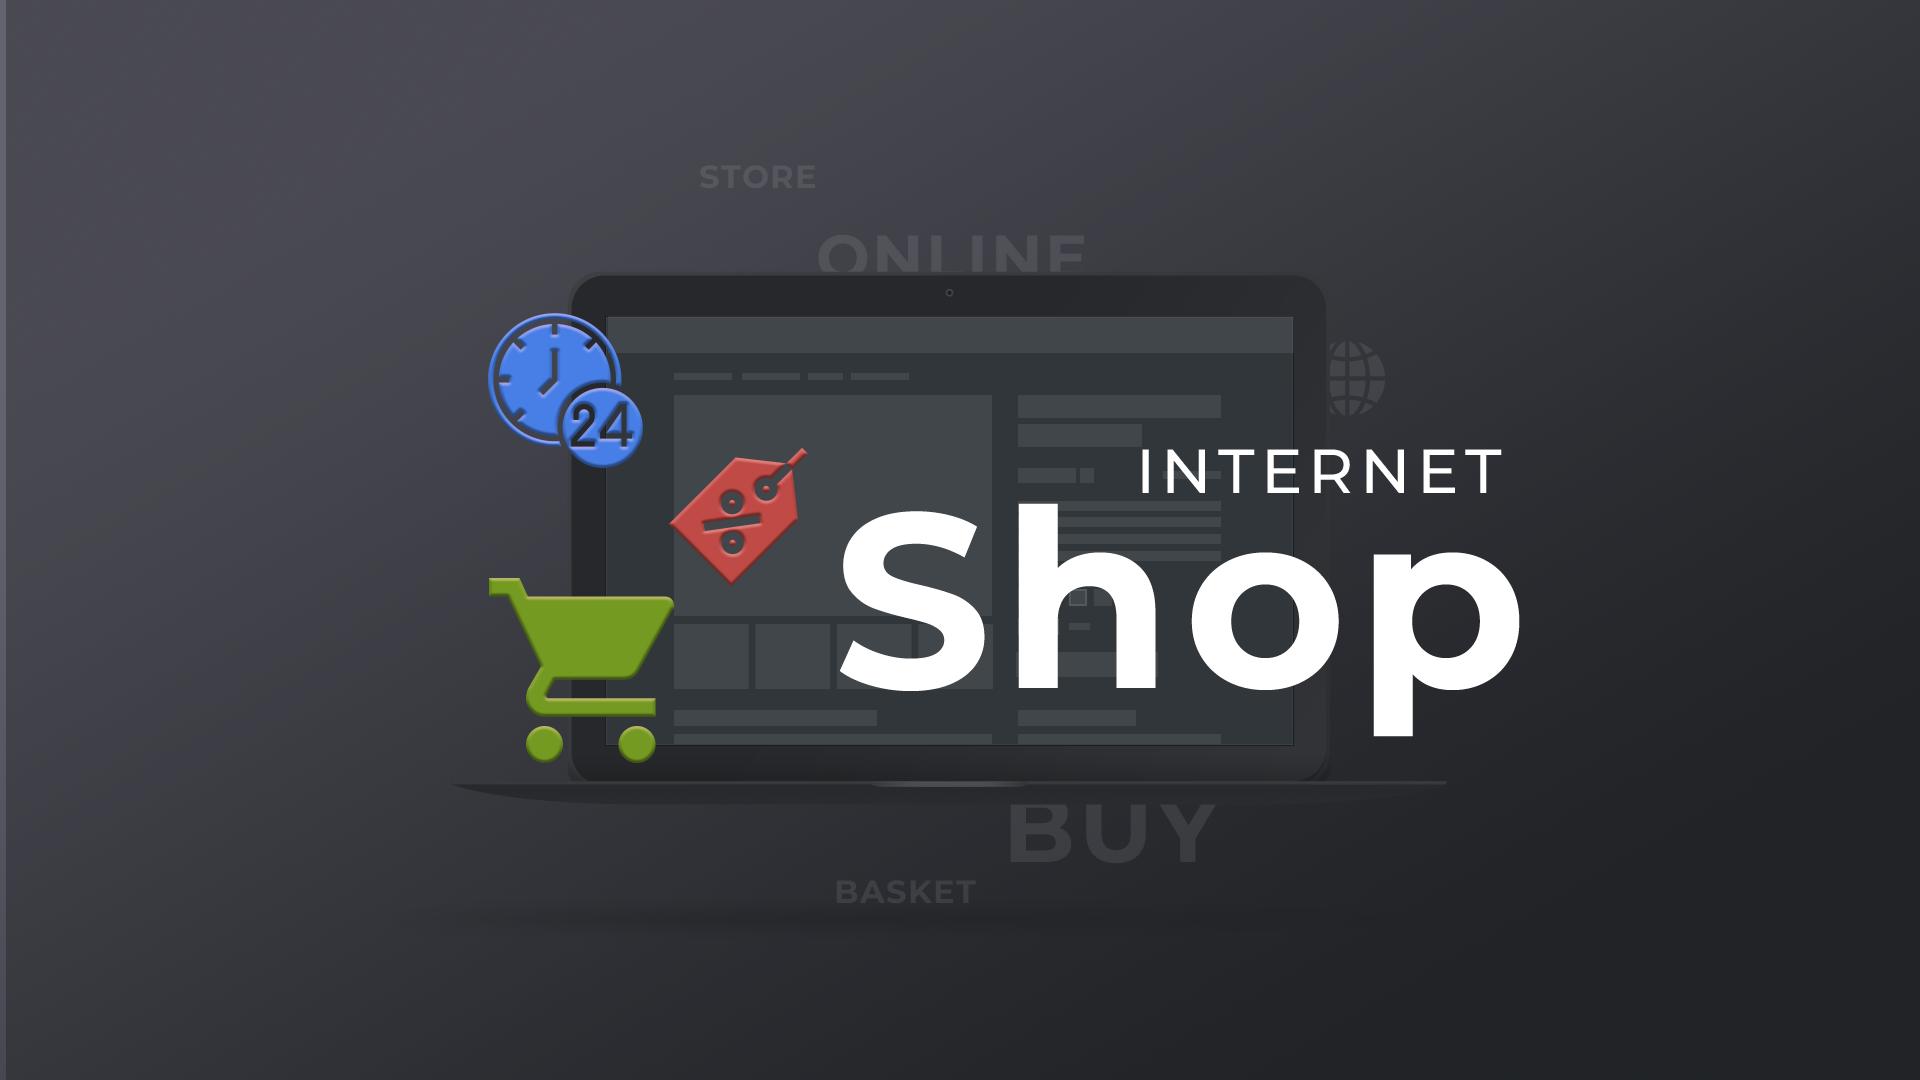 e shop - Дизайн інтернет-магазину